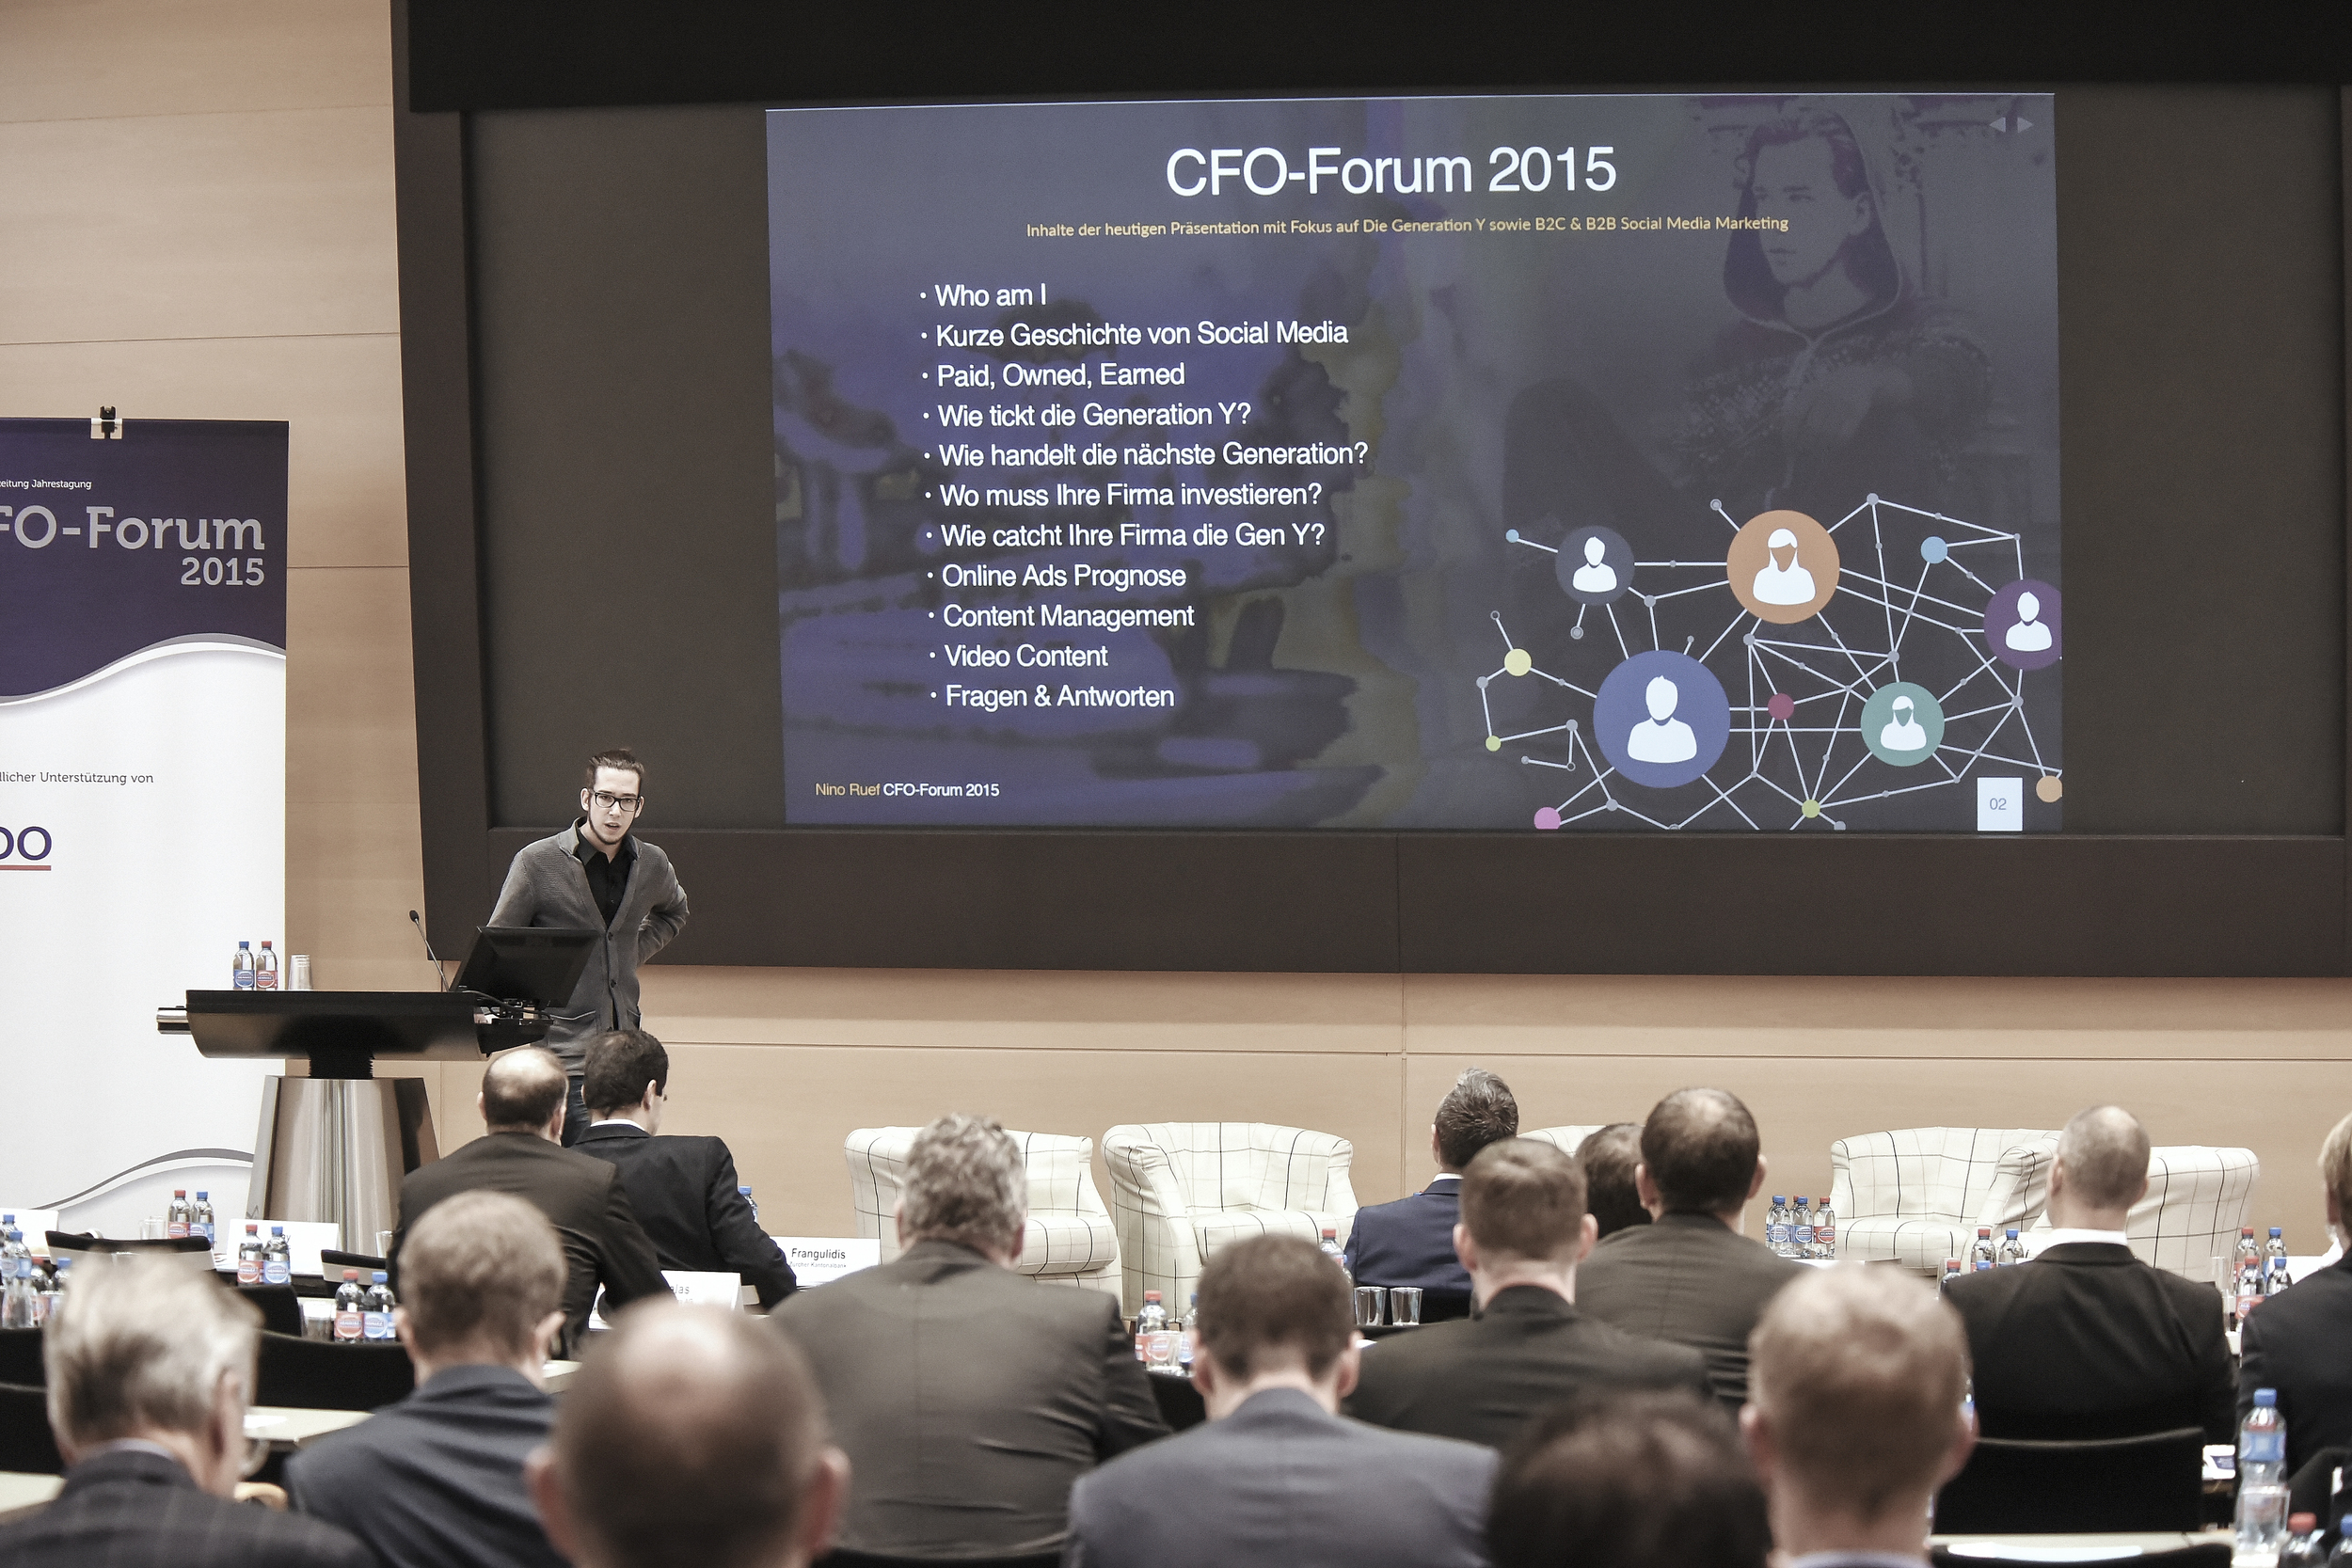 euroforum-cfoforum-ninoruef-presentation